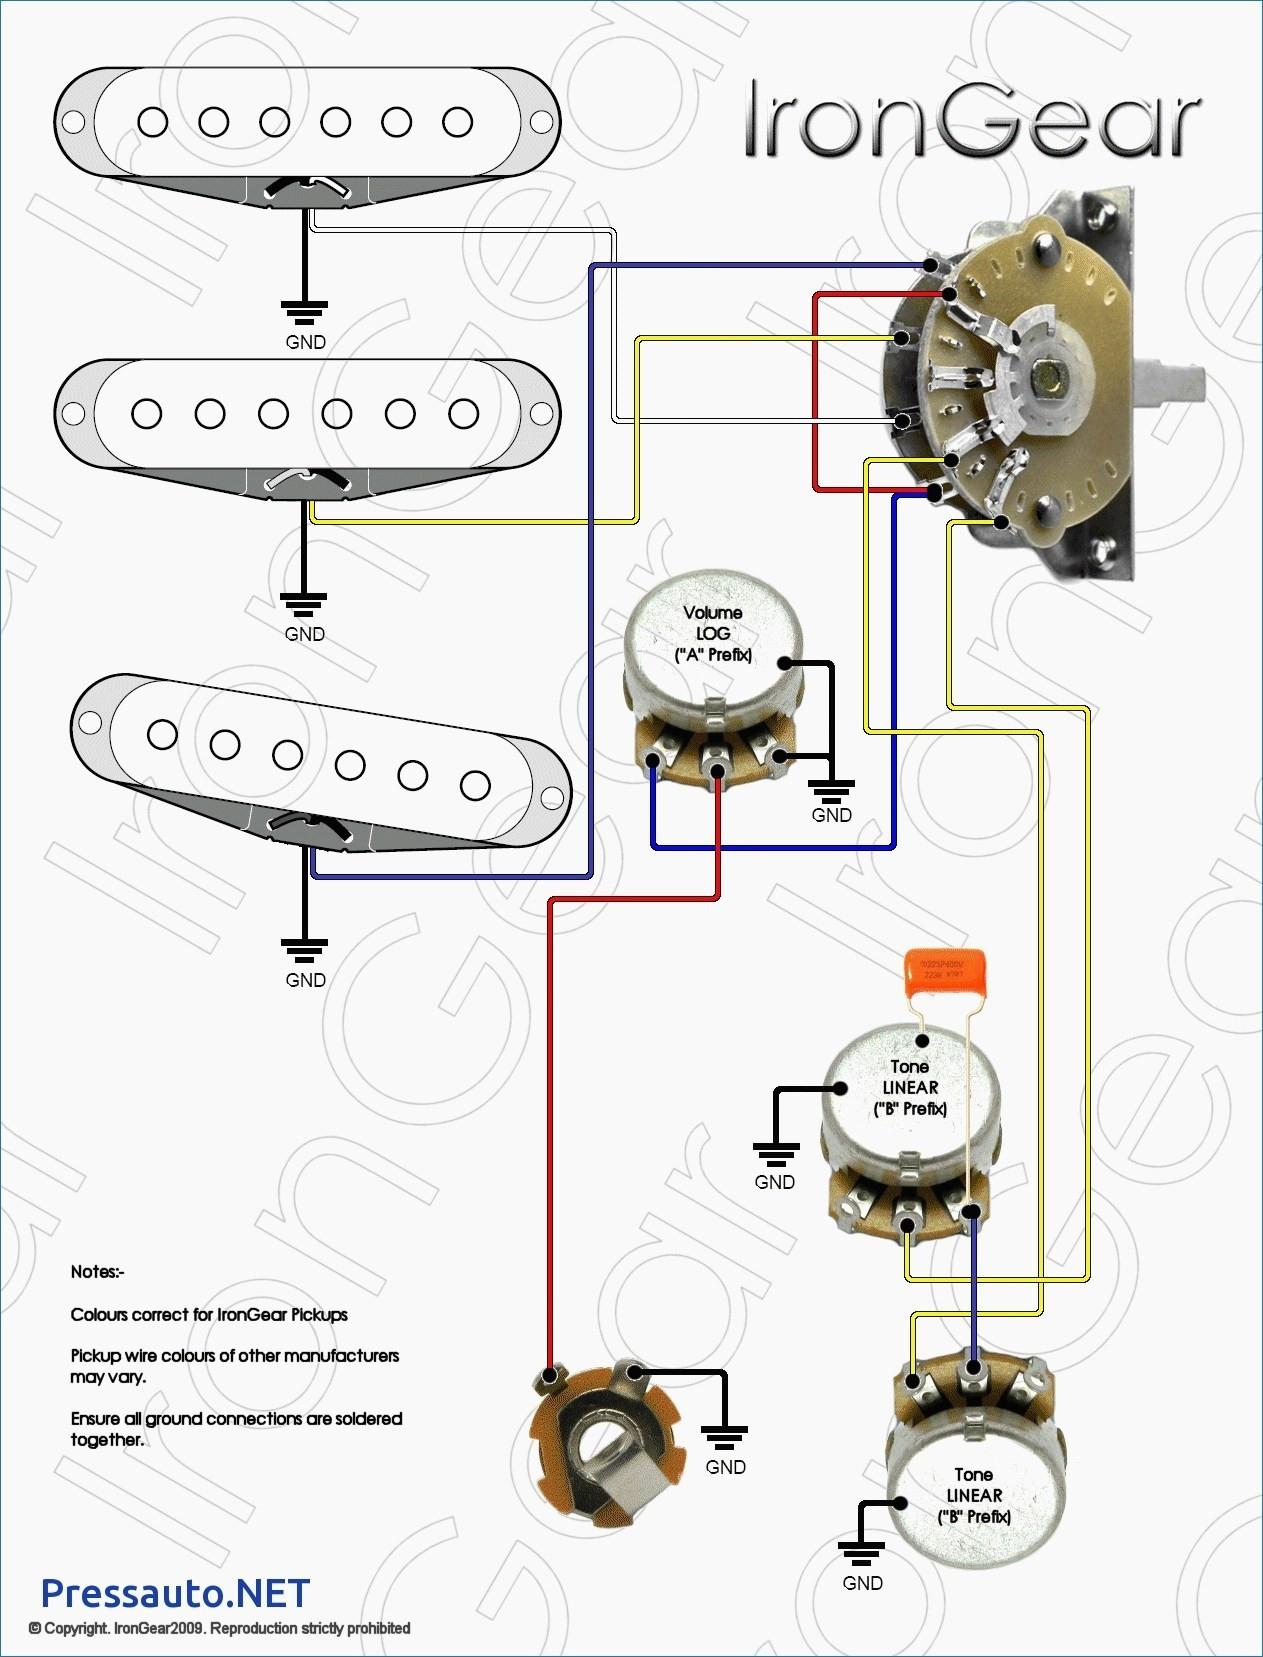 Stratocaster Wiring Diagram 3 Way Switch Simplified Shapes Strat - Strat Wiring Diagram